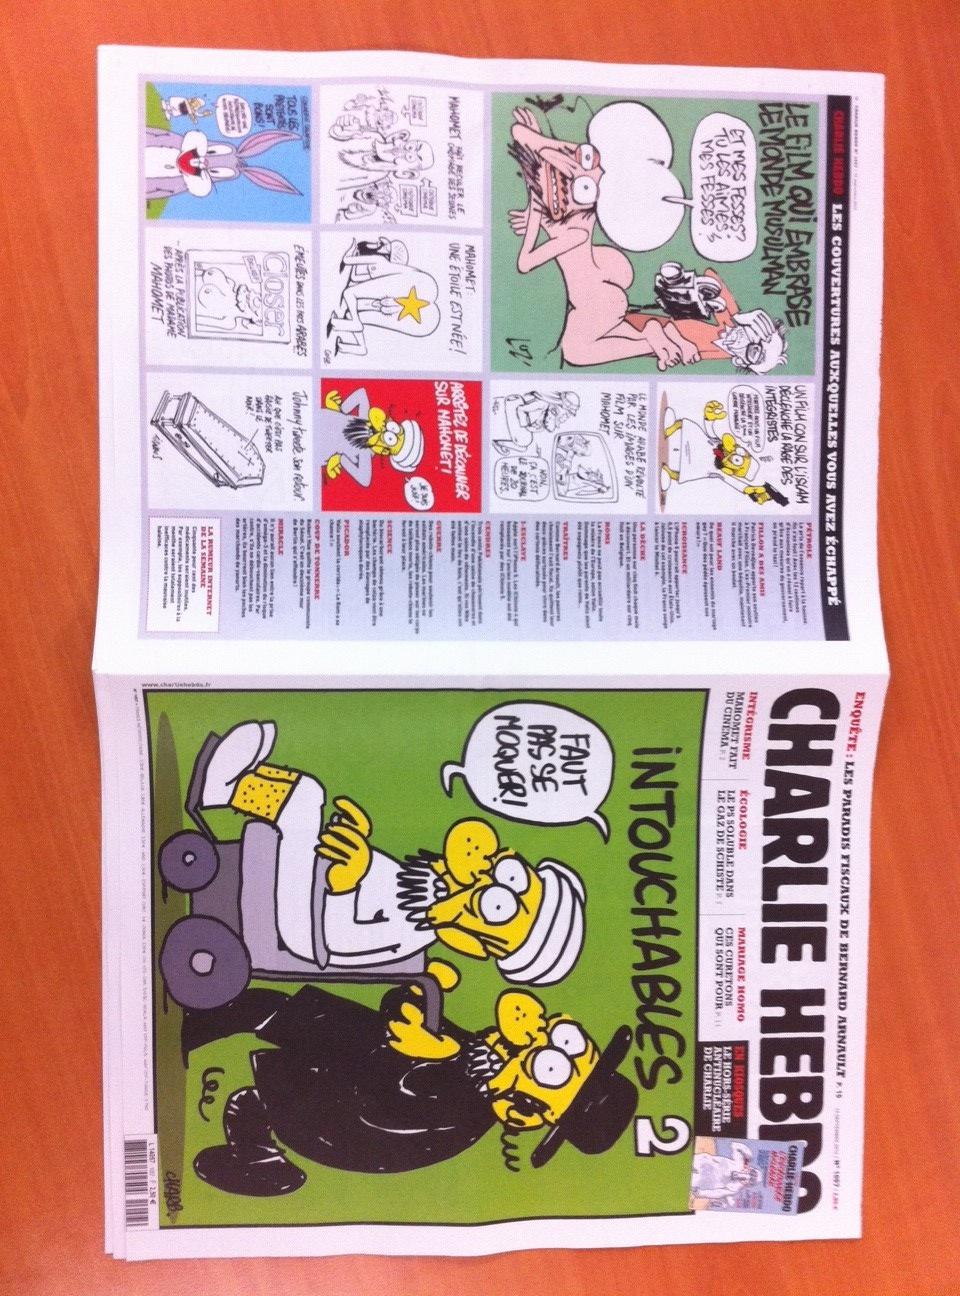 French-Magazines-Naked-Mohammed-Cartoons